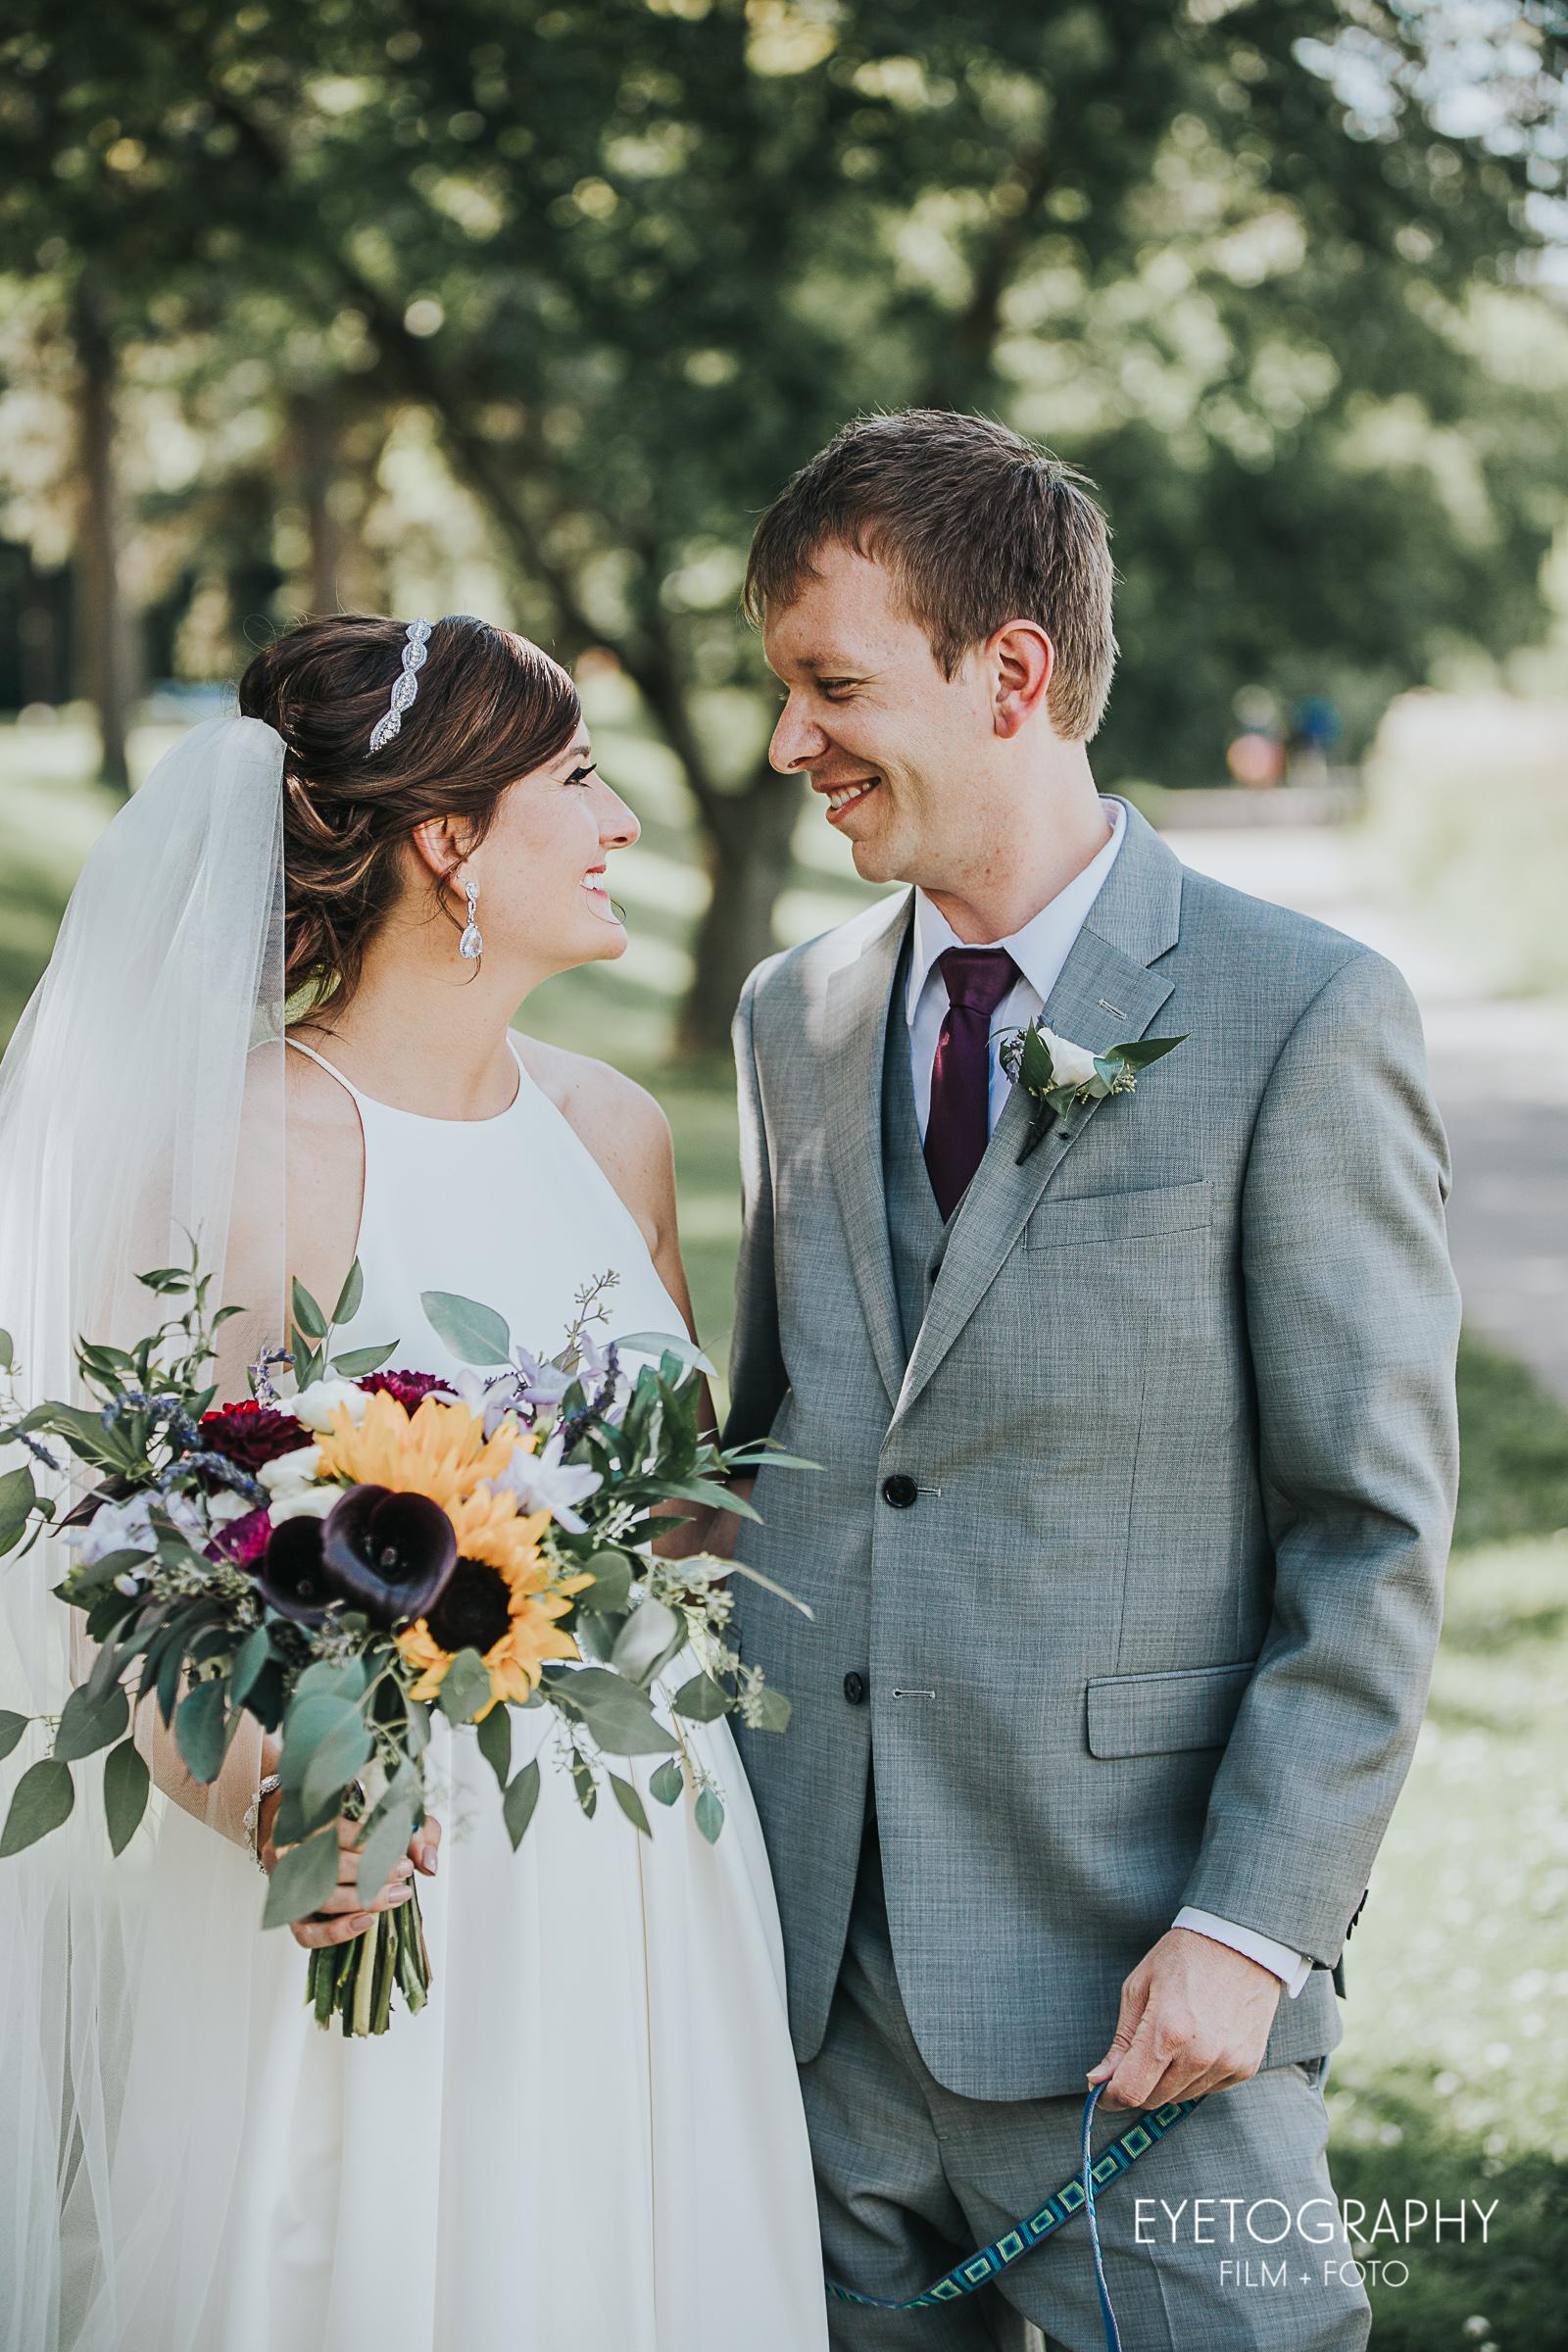 Eyetography Film + Foto - Jaimie and Dan Wedding-419.jpg